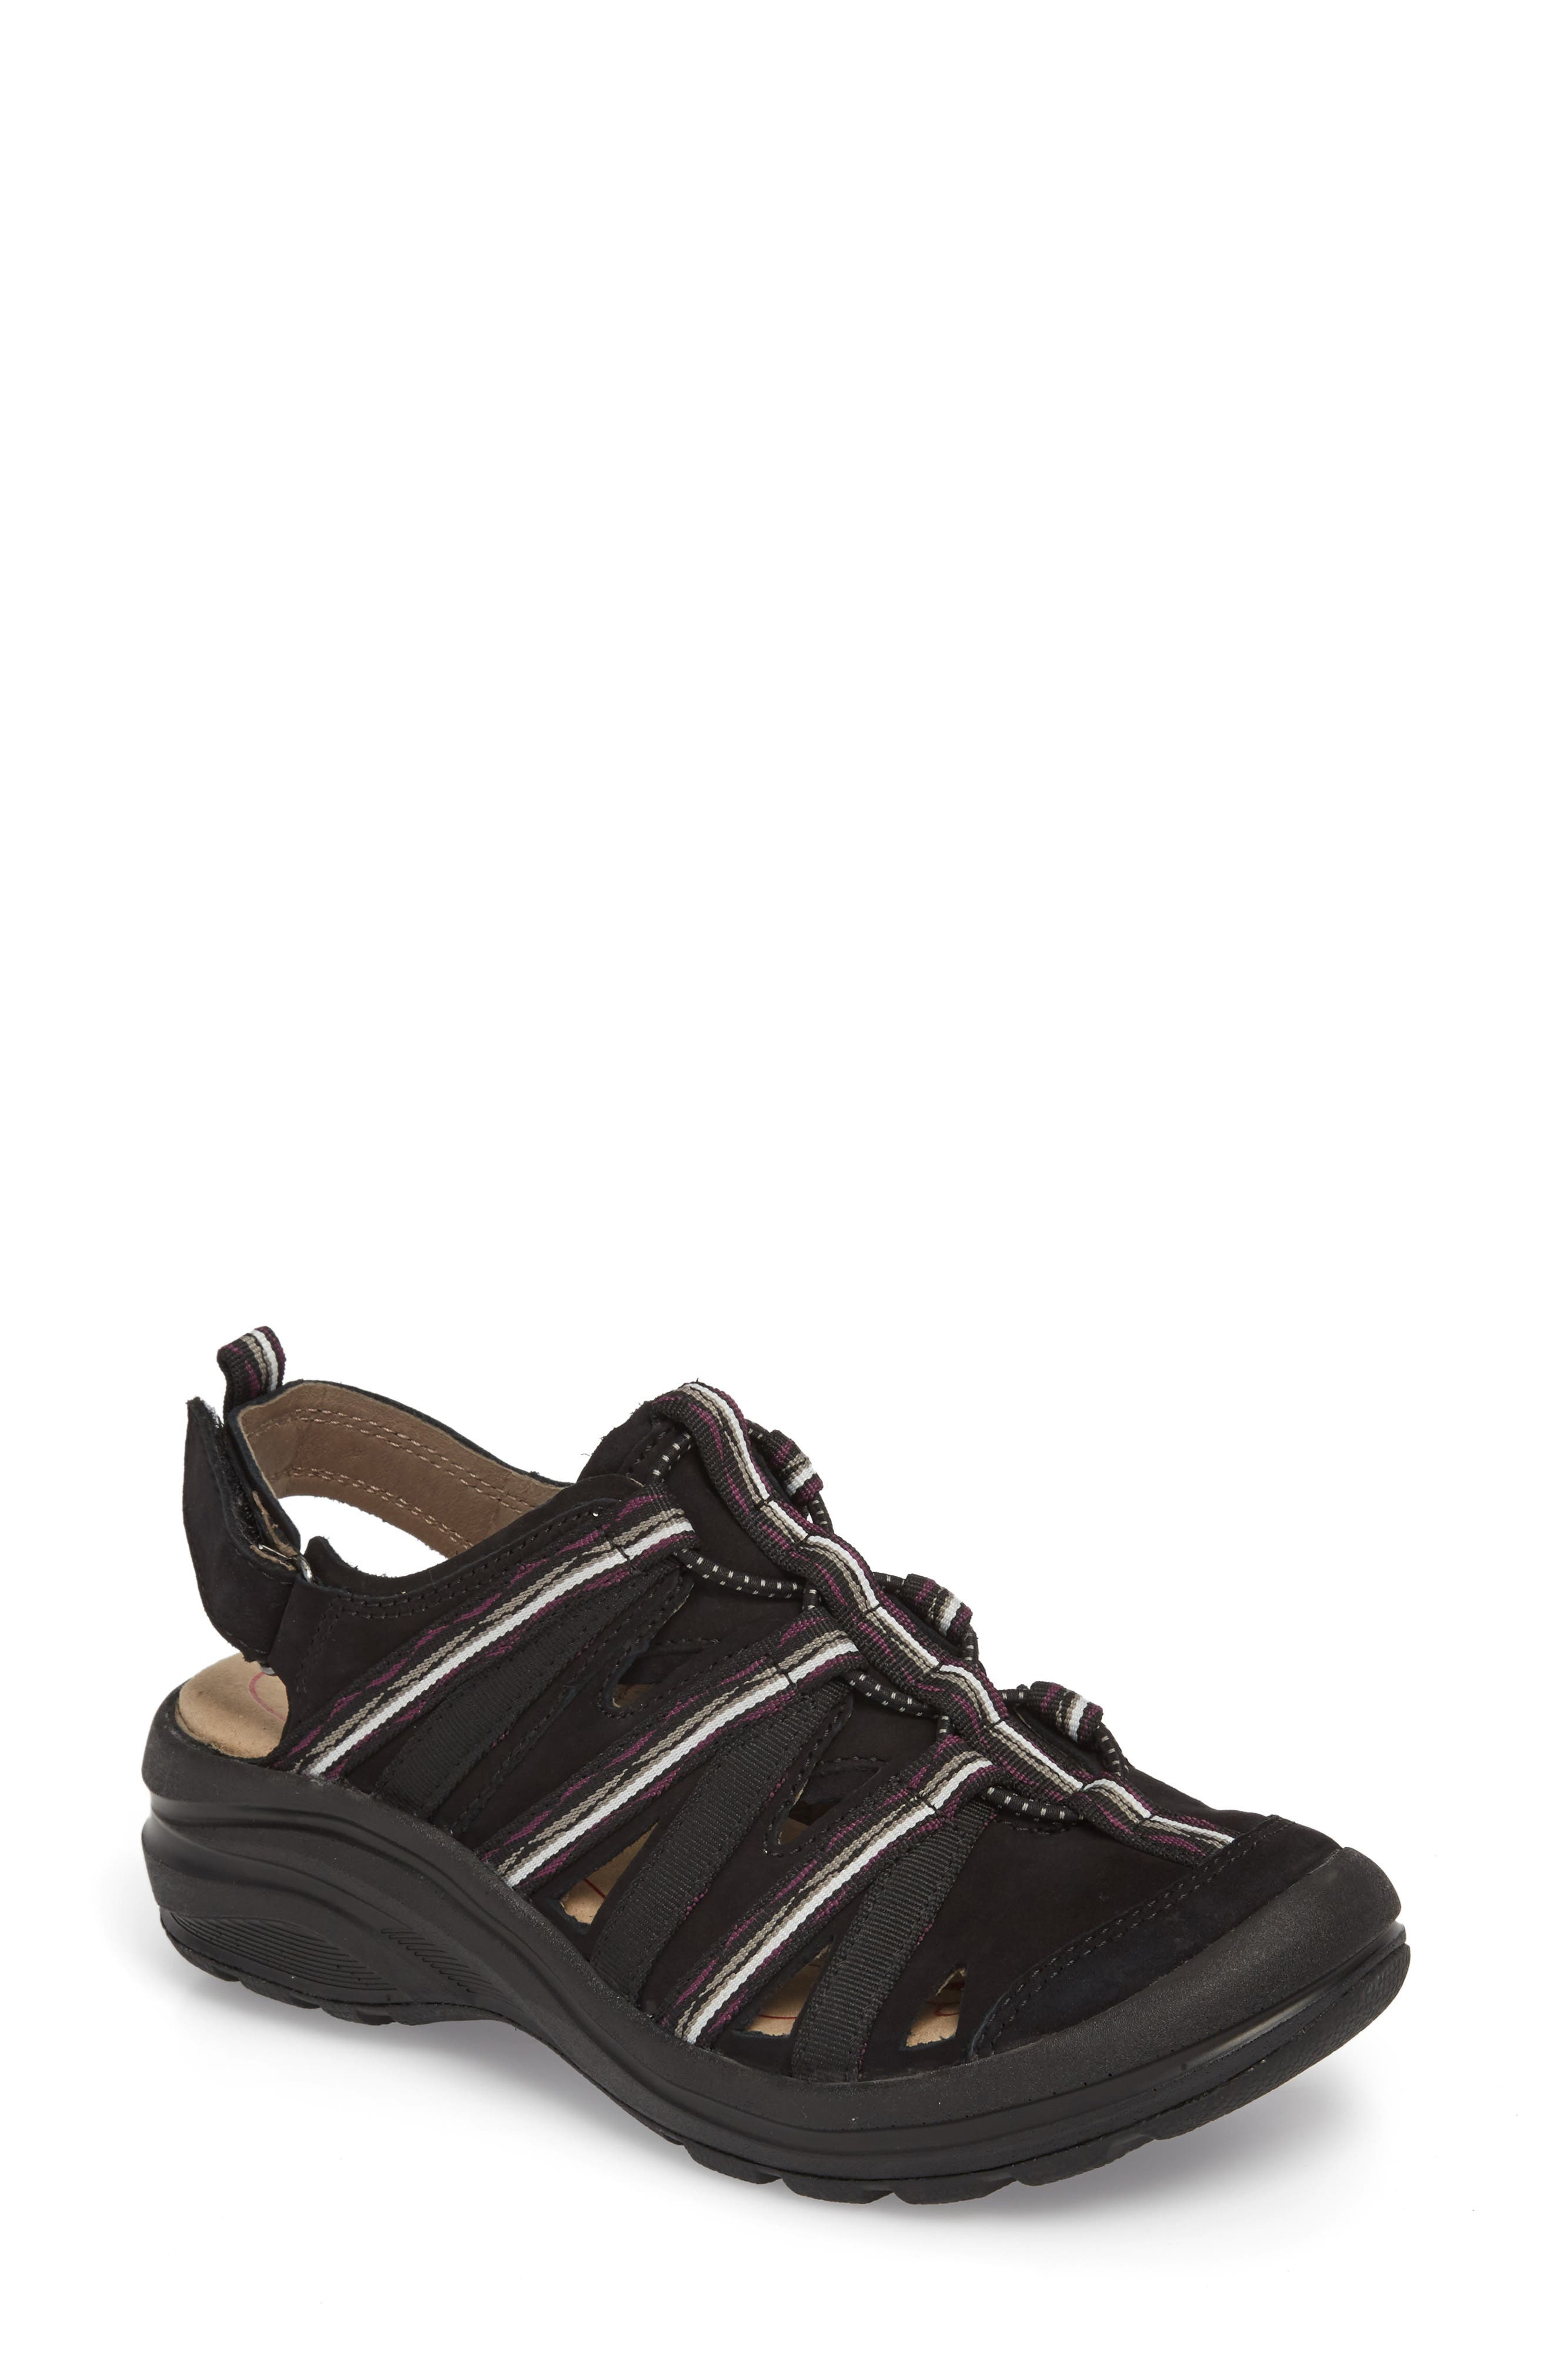 Malabar Sport Sandal,                         Main,                         color, BLACK LEATHER